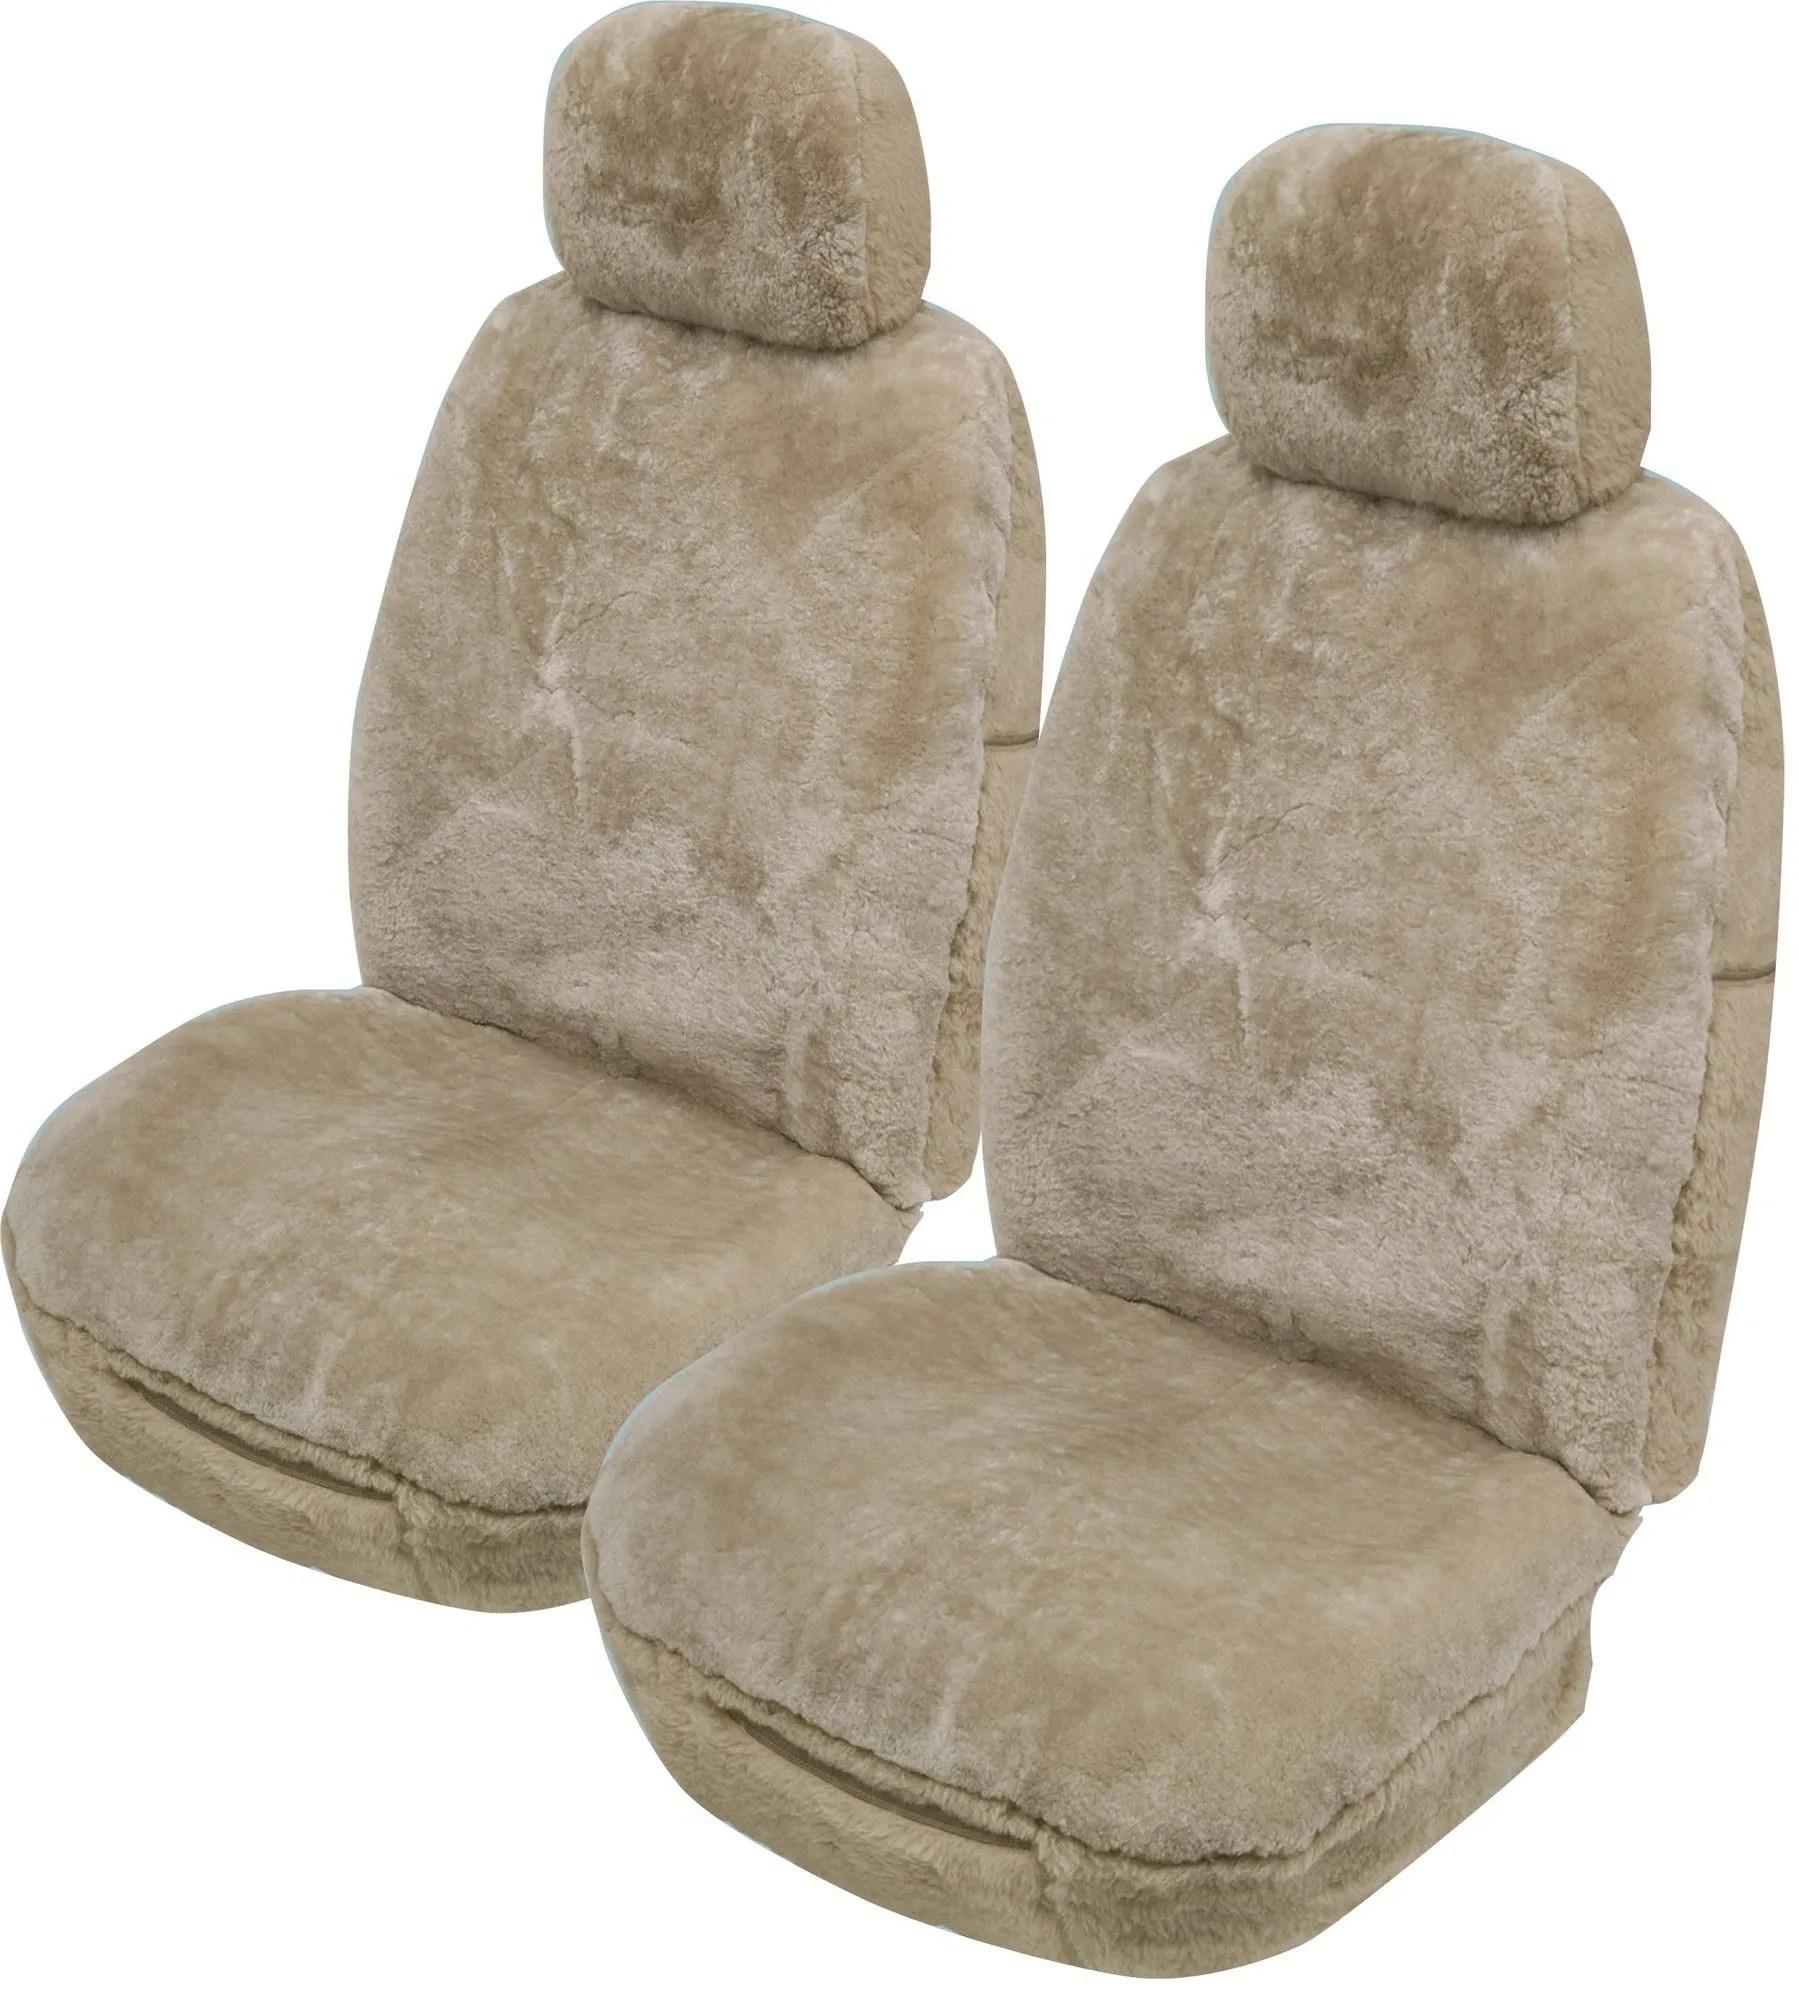 animal skin chair covers foam toddler adventurer